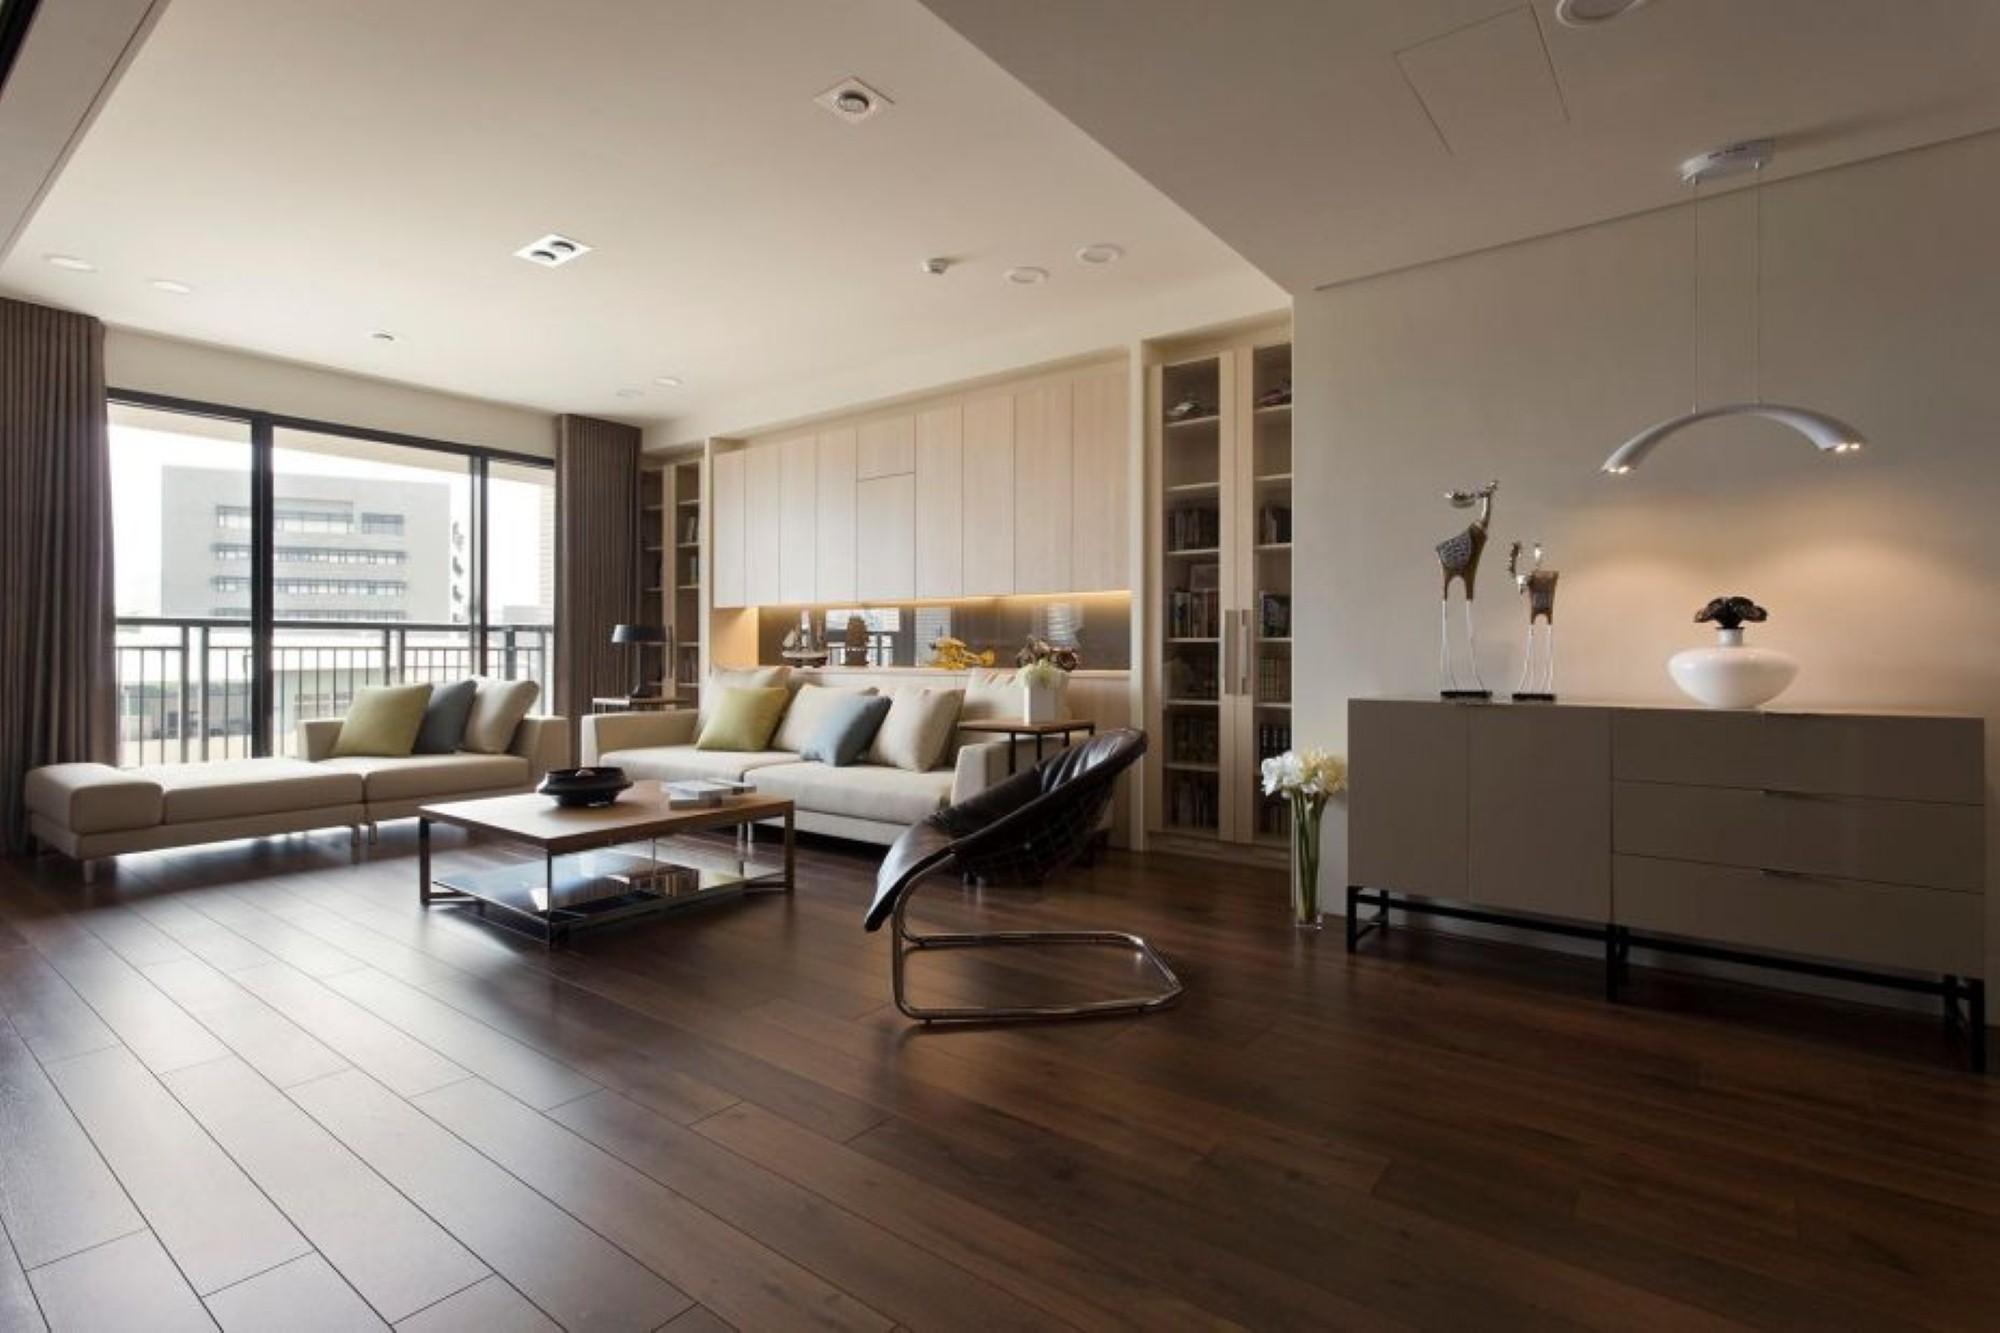 Однокомнатная квартира 40 кв м бежевая